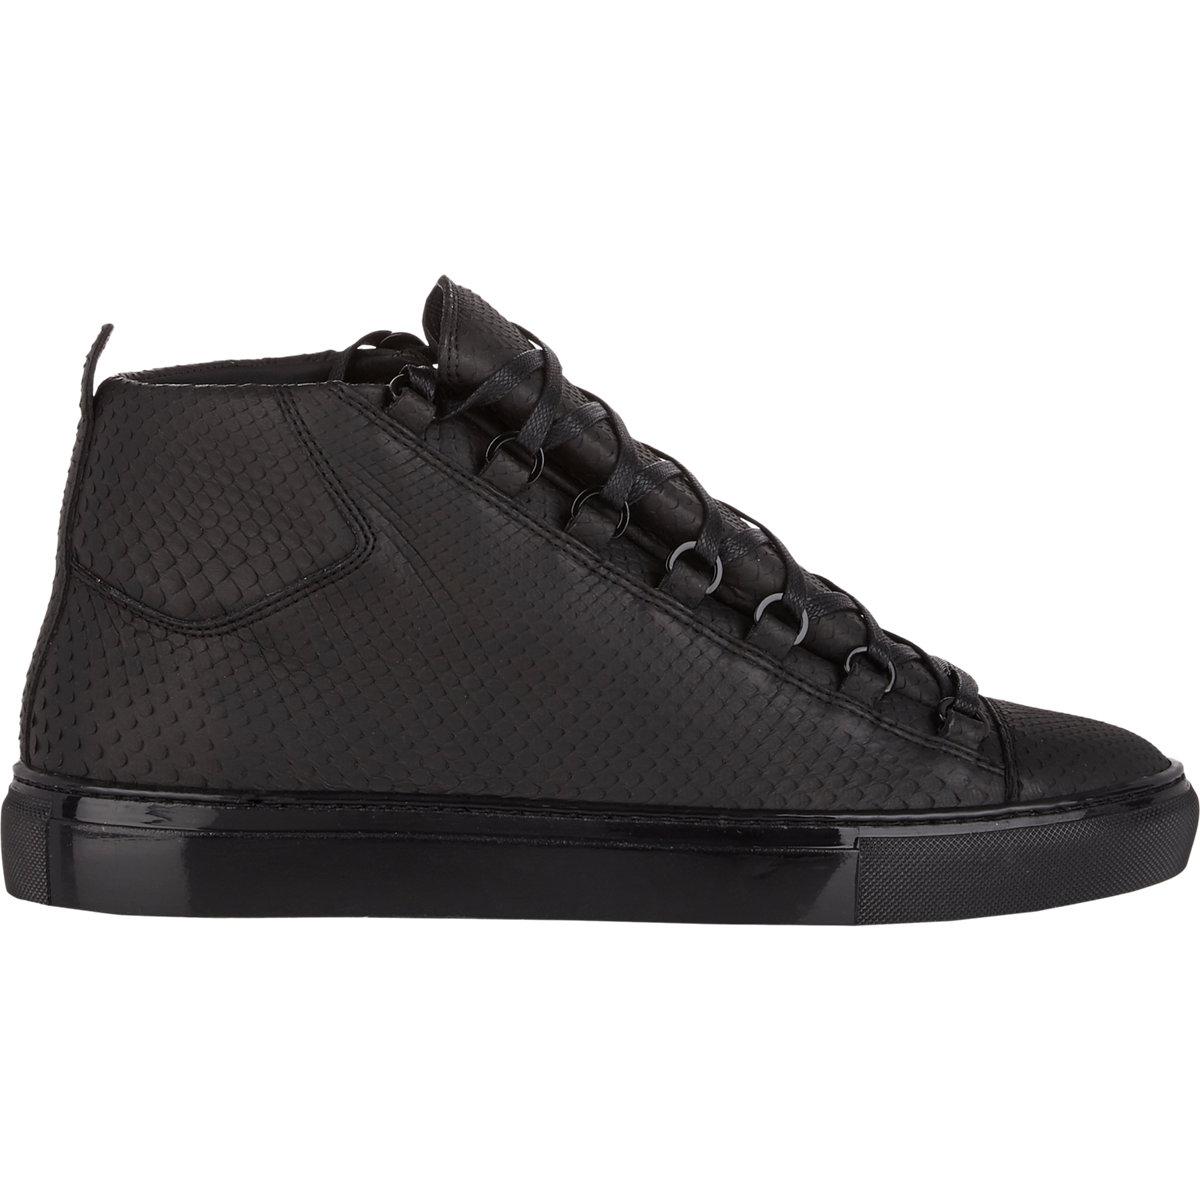 balenciaga python low top arena sneakers black size 7 in black for men lyst. Black Bedroom Furniture Sets. Home Design Ideas